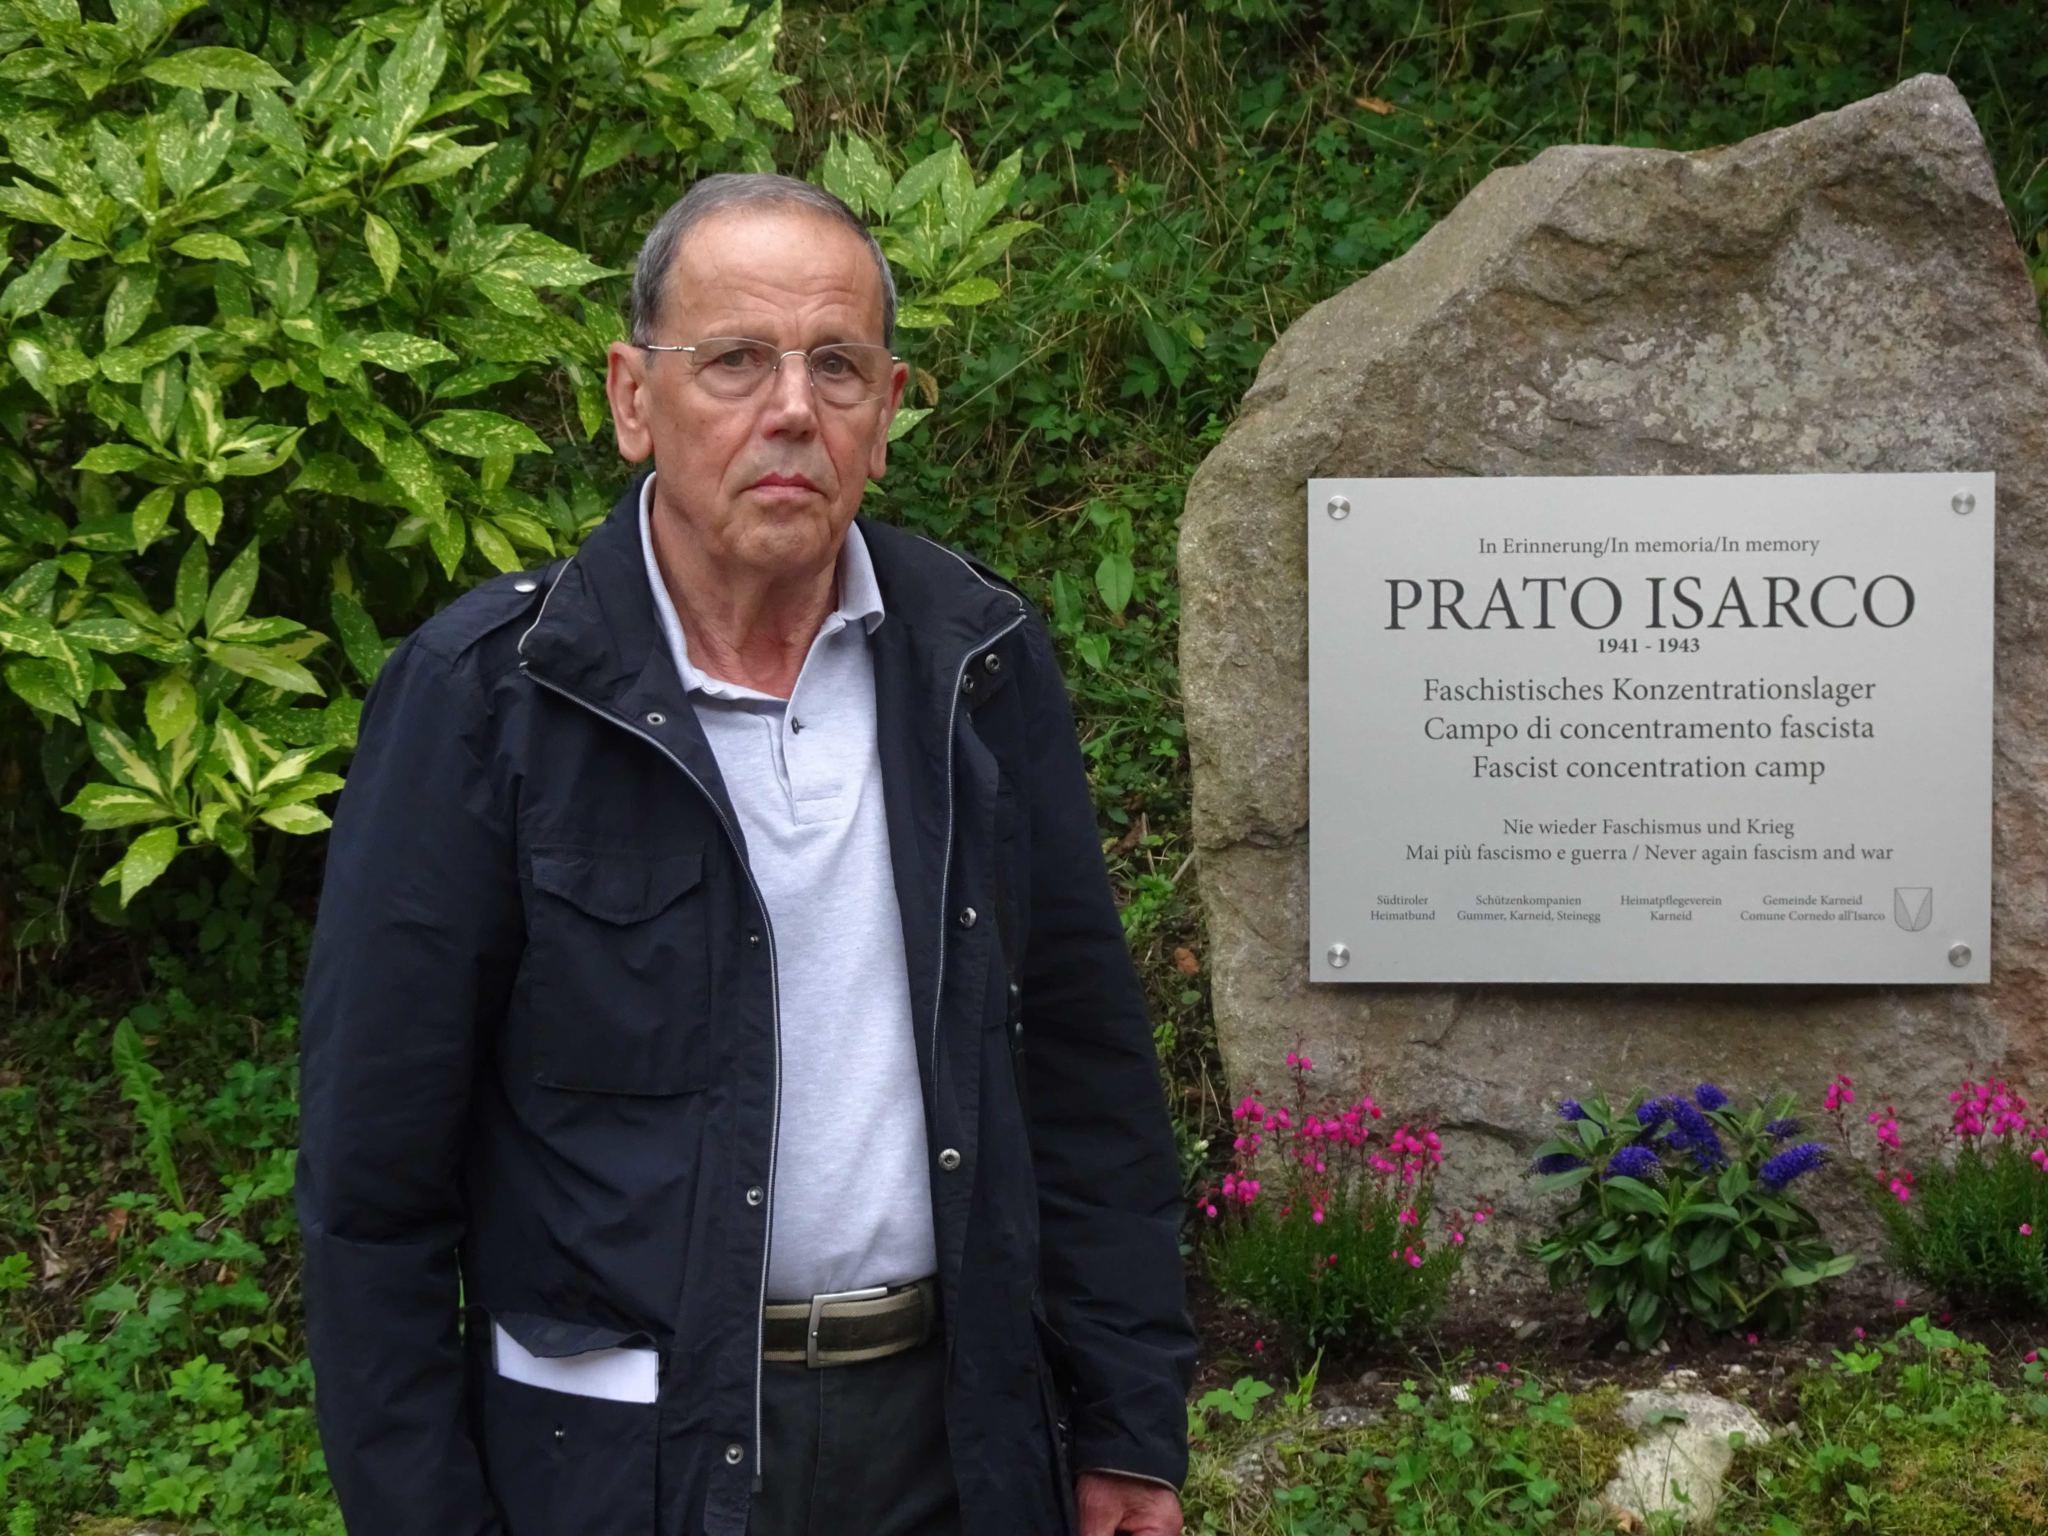 Giuseppe Matuella am Gedenkstein